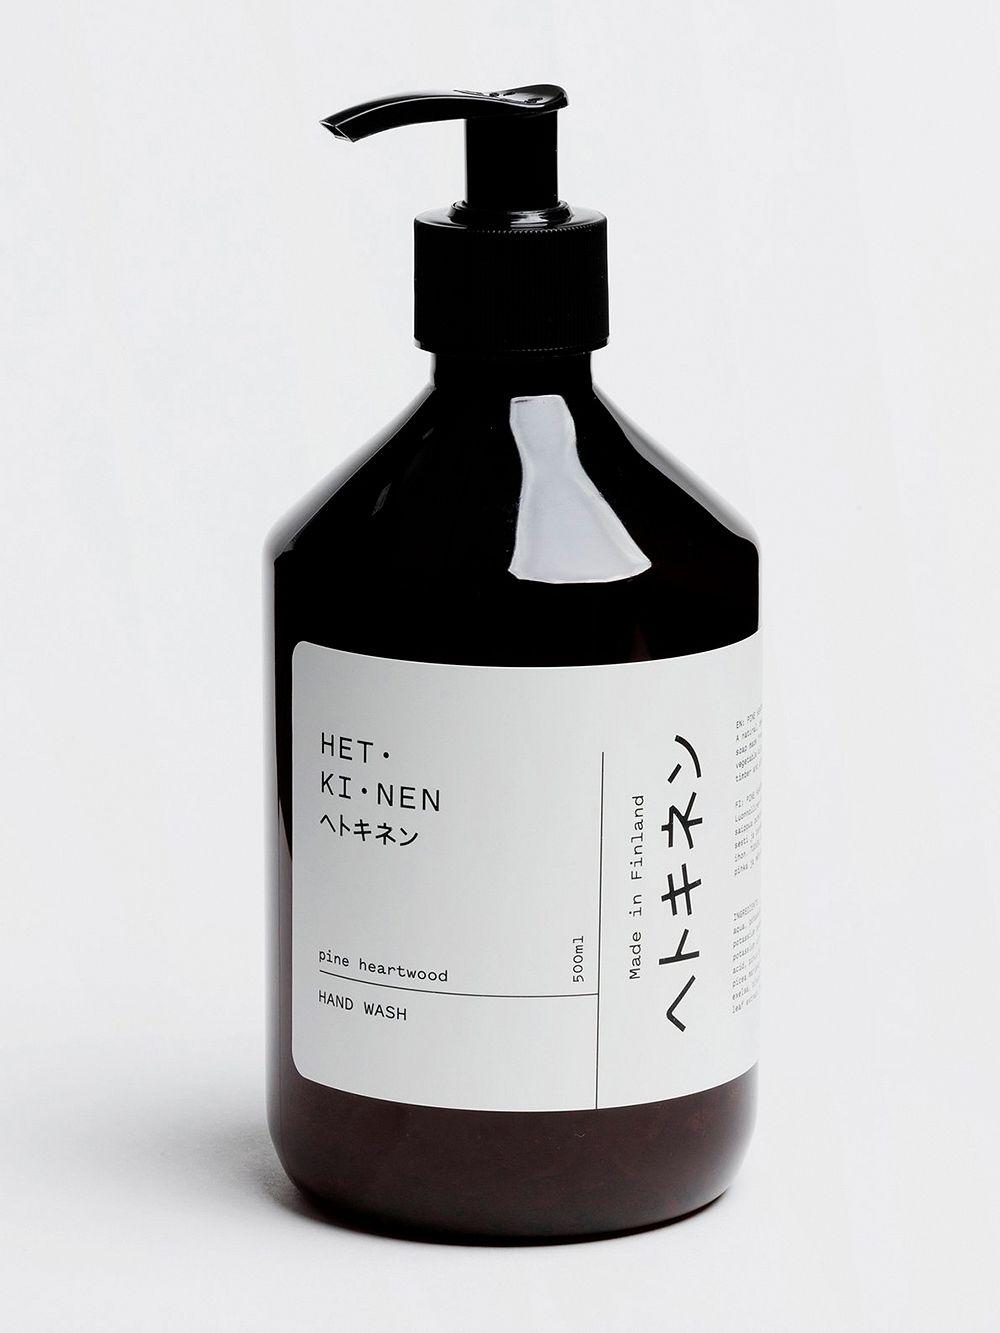 Hetkinen Hand wash, 500 ml, pine heartwood